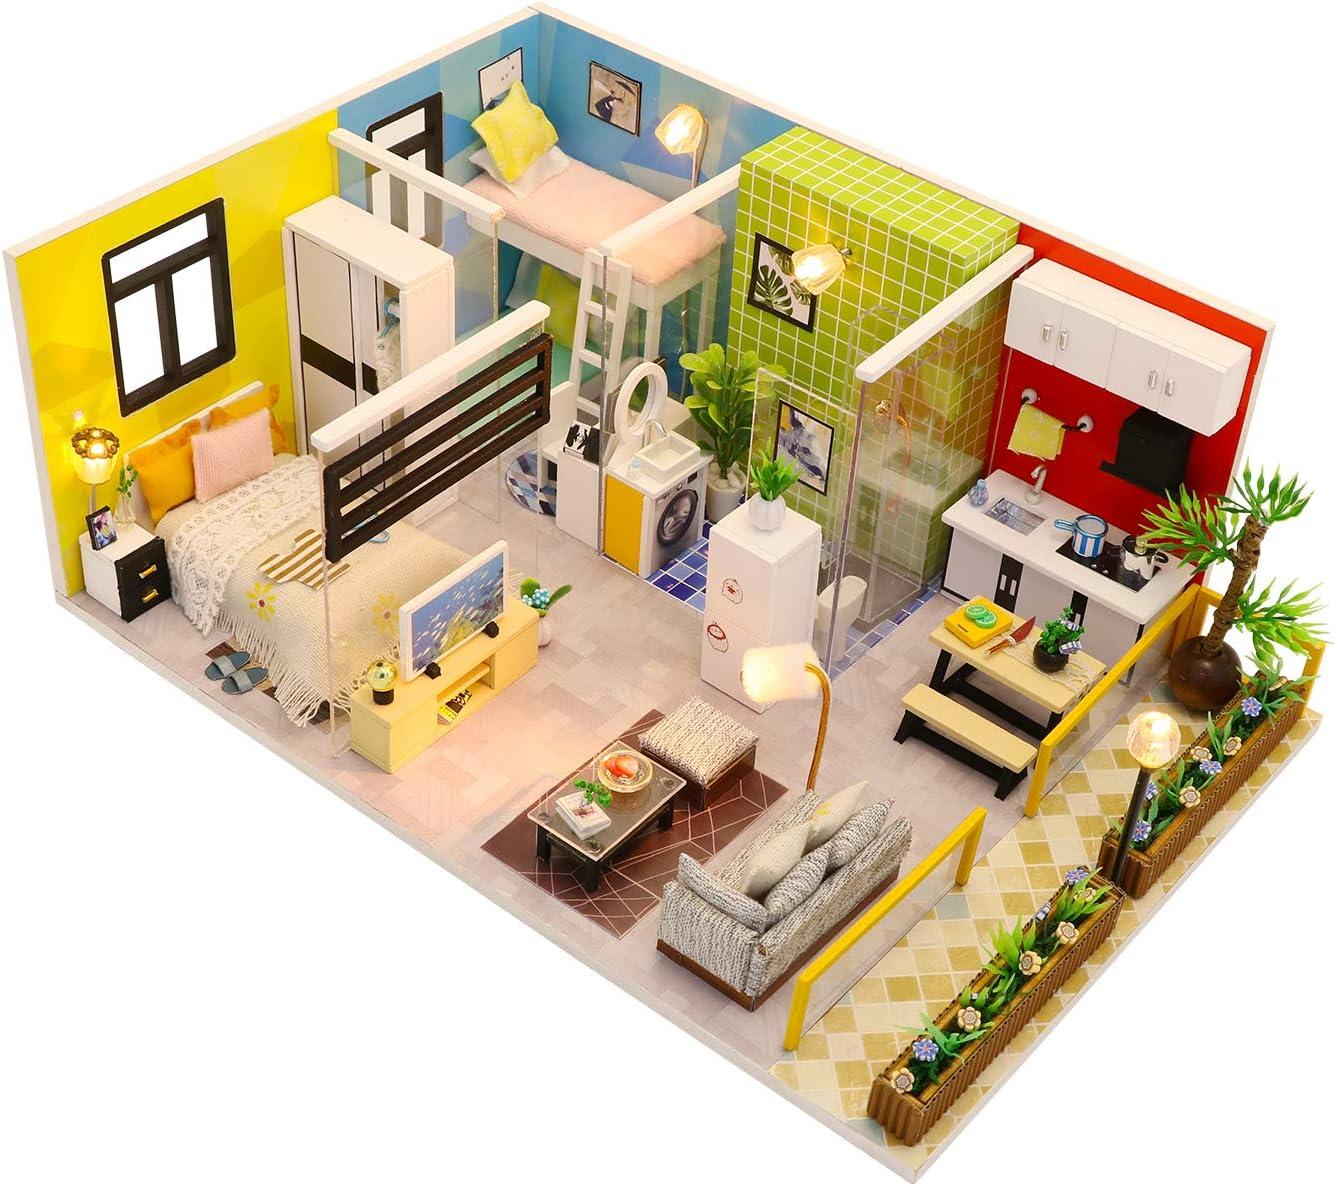 Monarca. Simple Life. DIY Miniature Dollhouse Kit – Mini House Making Kit with Miniature Dollhouse Accessories – Tiny House Building Kit – Ideal Doll House for Kids and Grown Ups